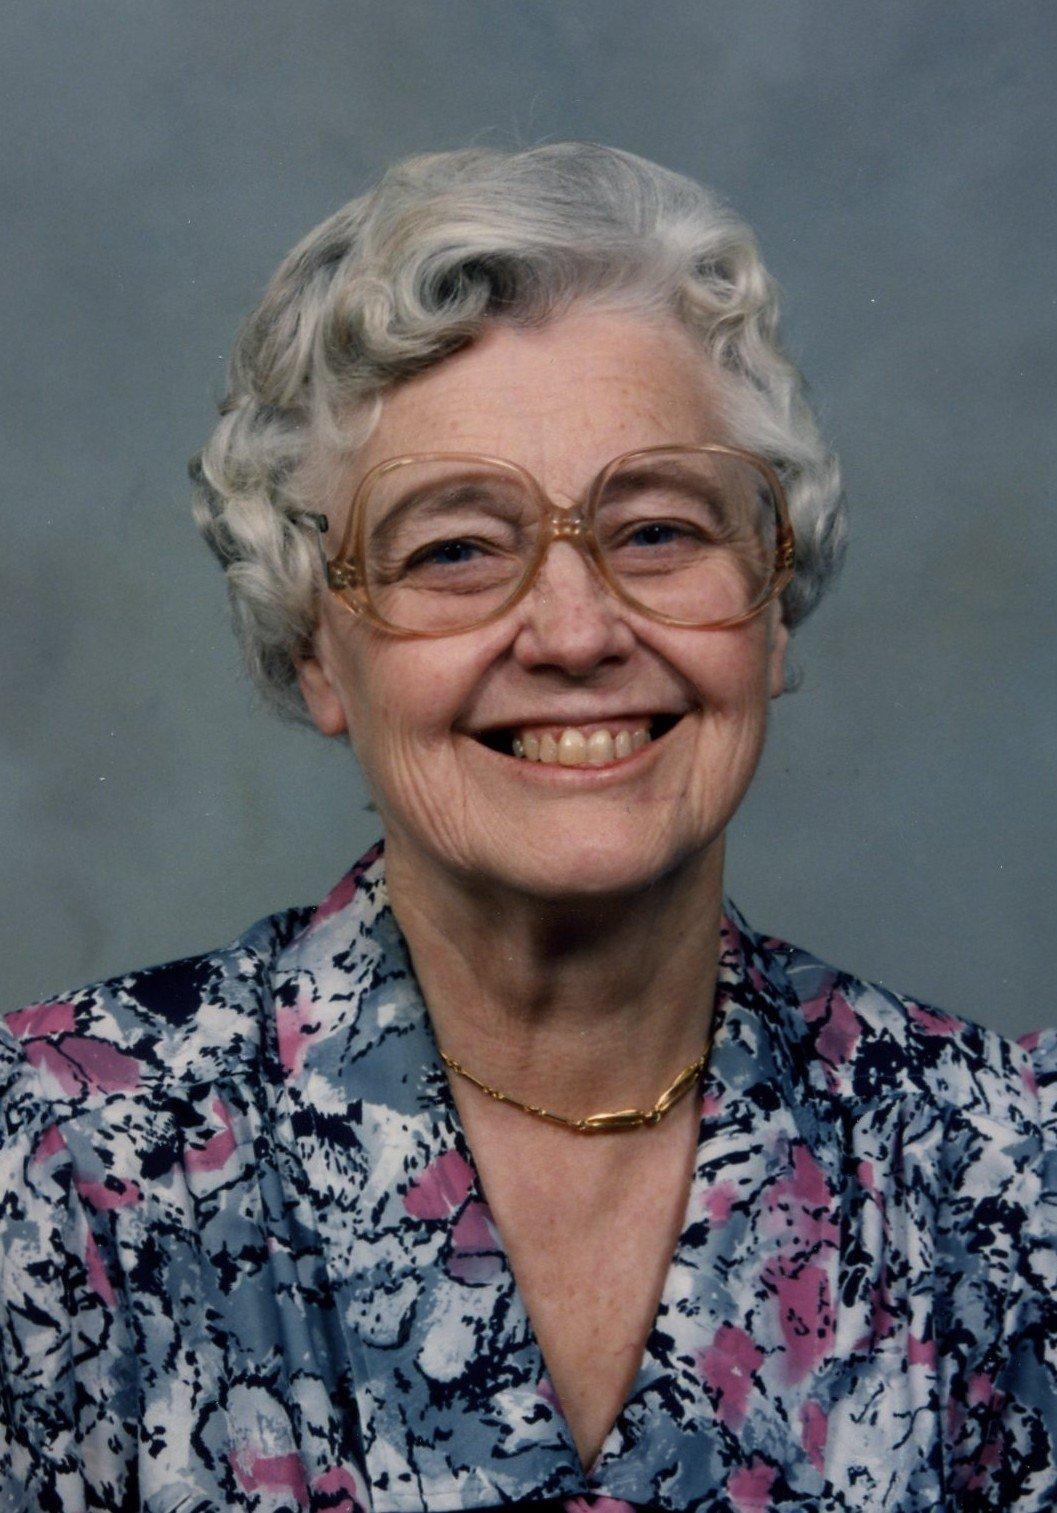 Margaret Cooper SmaIe